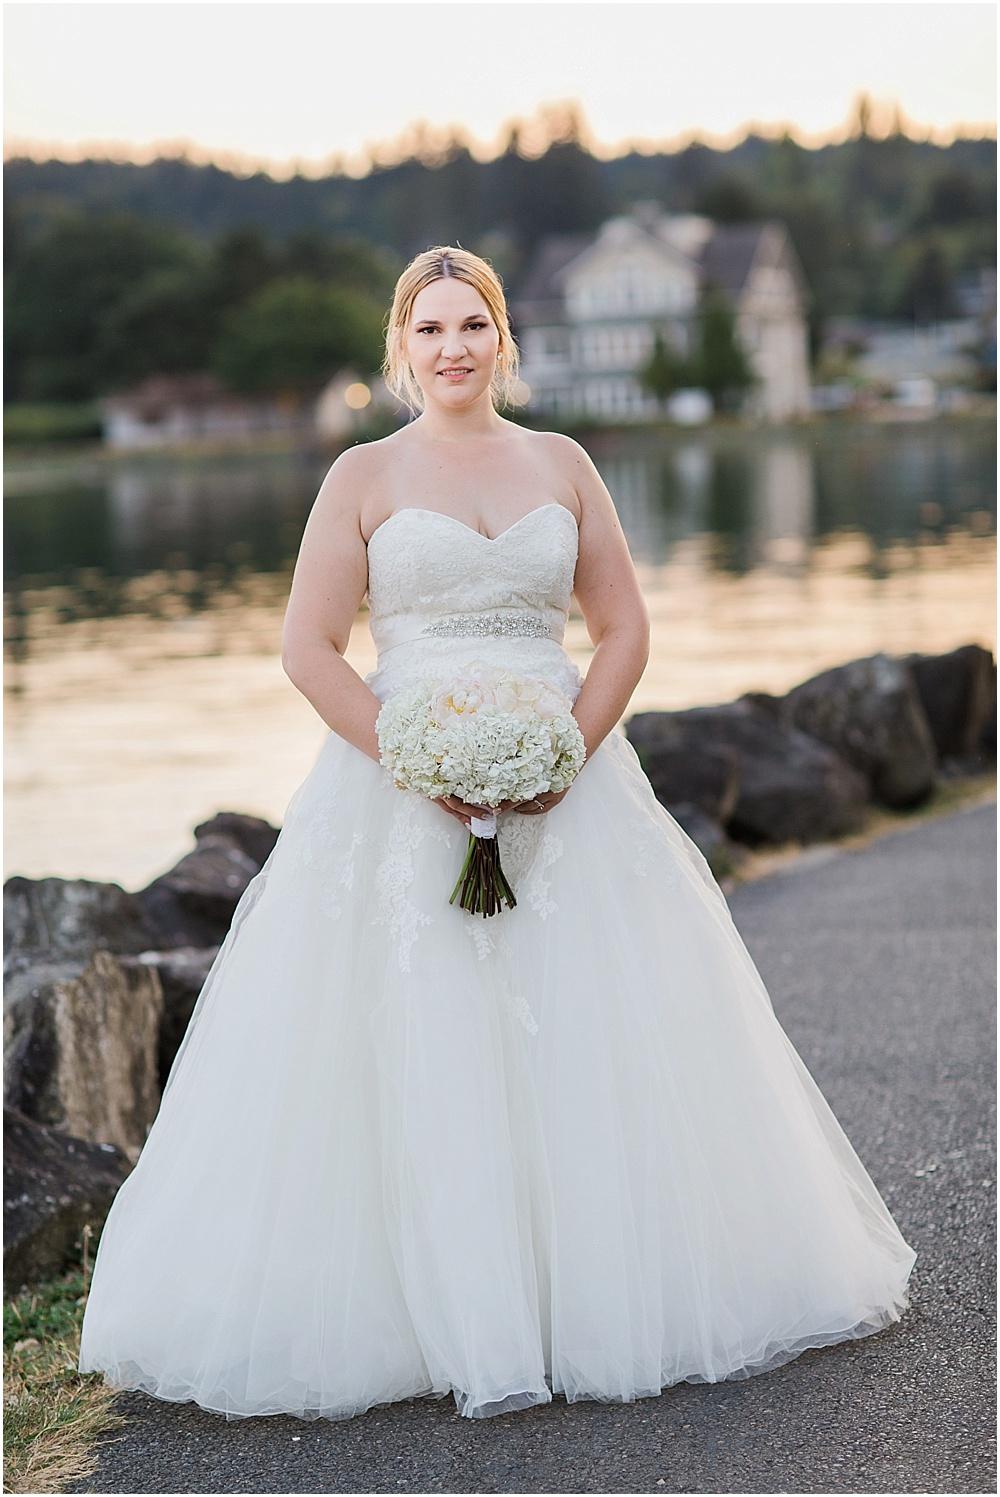 mitzner_silverdale_beach_hotel_wedding_silverdale_washington_pacific_northwest_wedding_photographer_0093